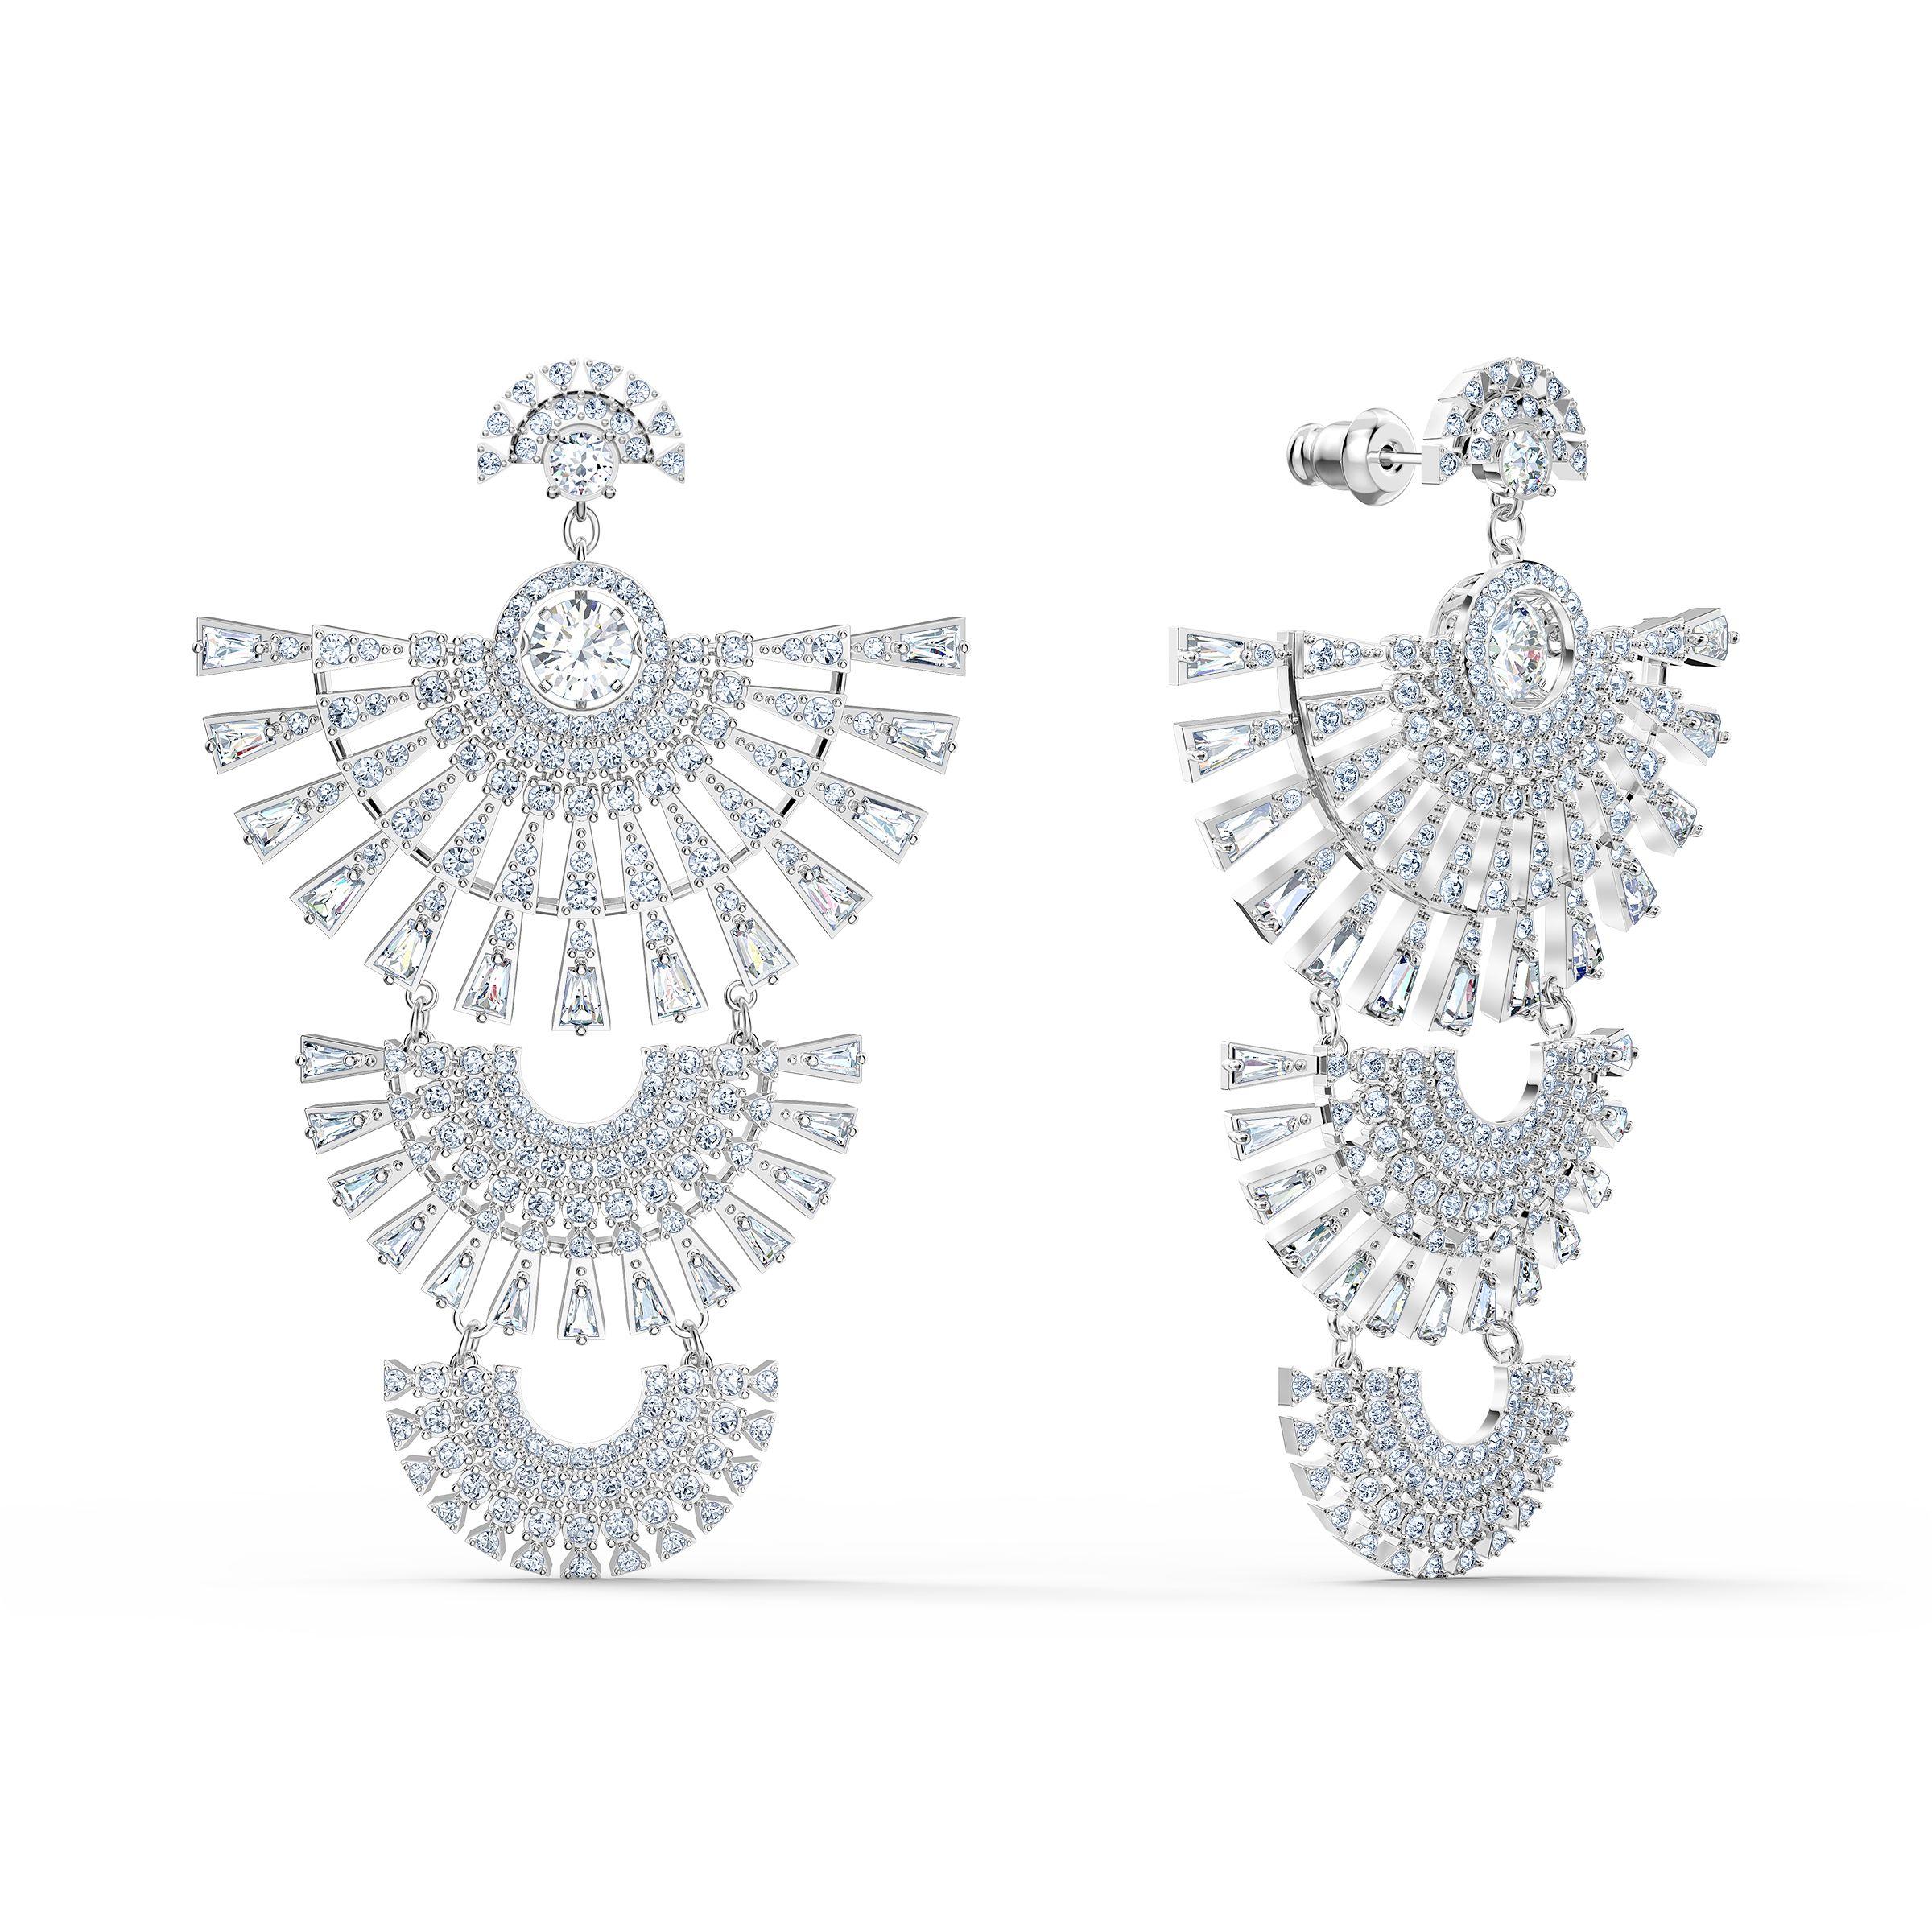 Boucles d'oreilles Swarovski Sparkling Dance Dial Up, blanc, métal rhodié, Swarovski